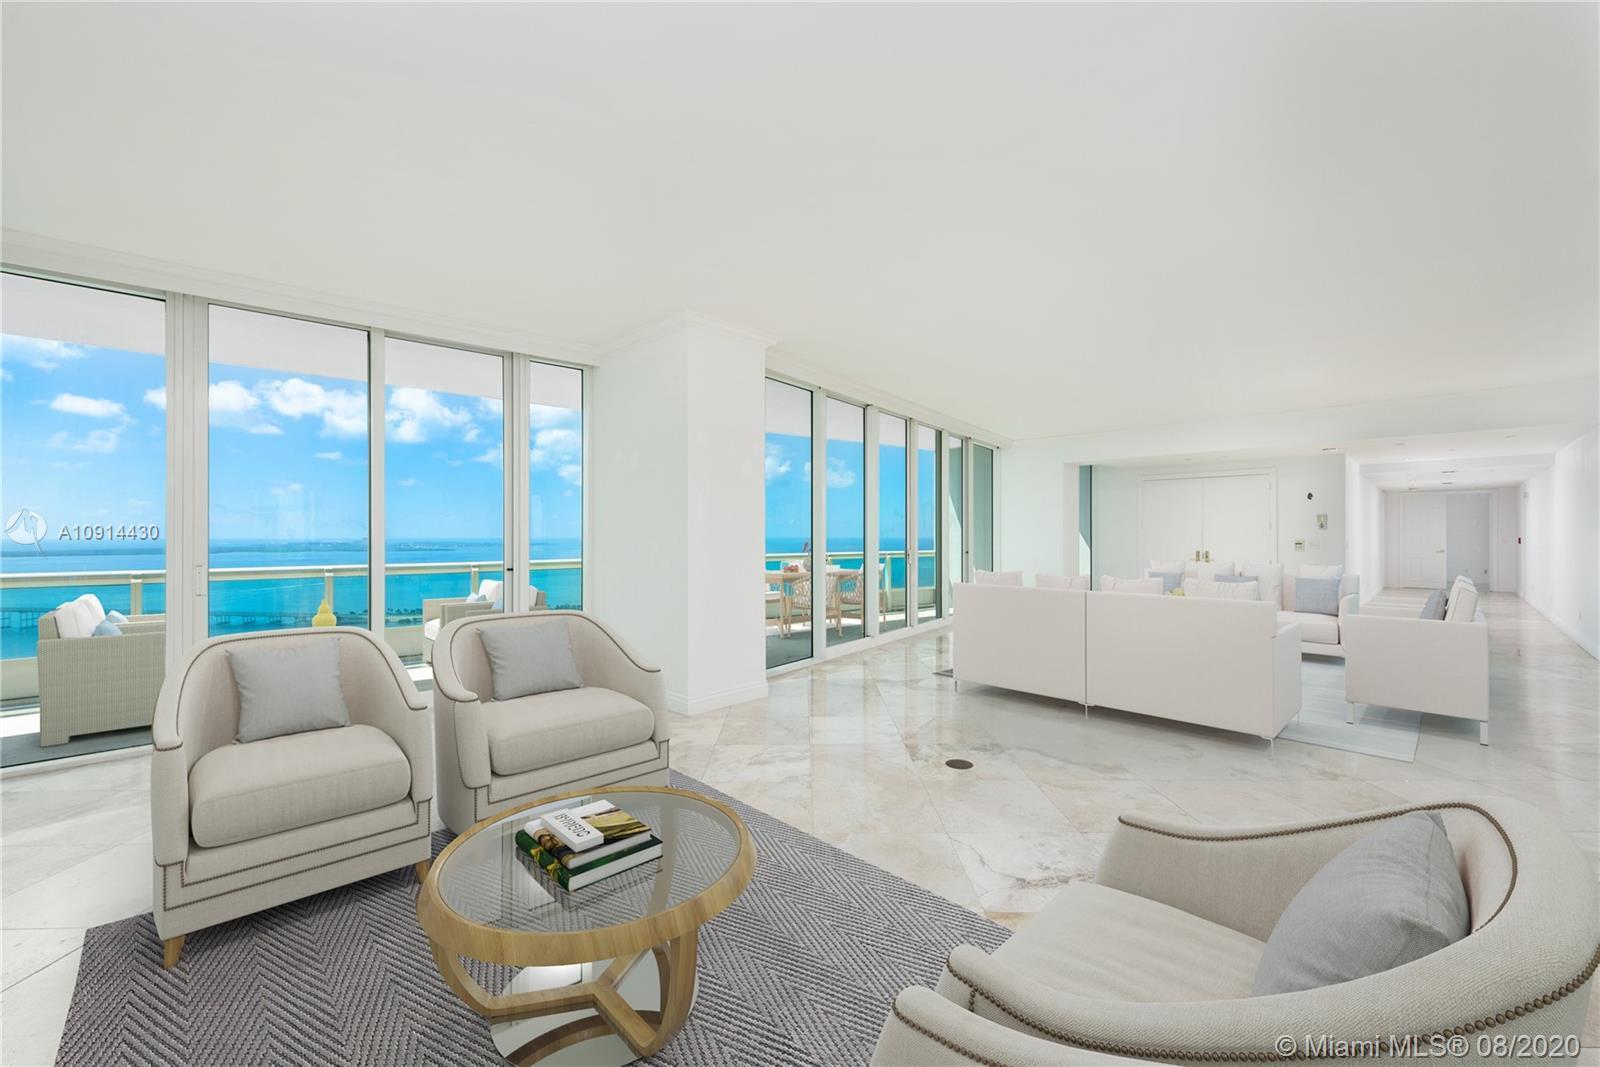 Situated atop the prestigious, full-service, white-glove Santa Maria, this spectacular 6,300 SqFt li